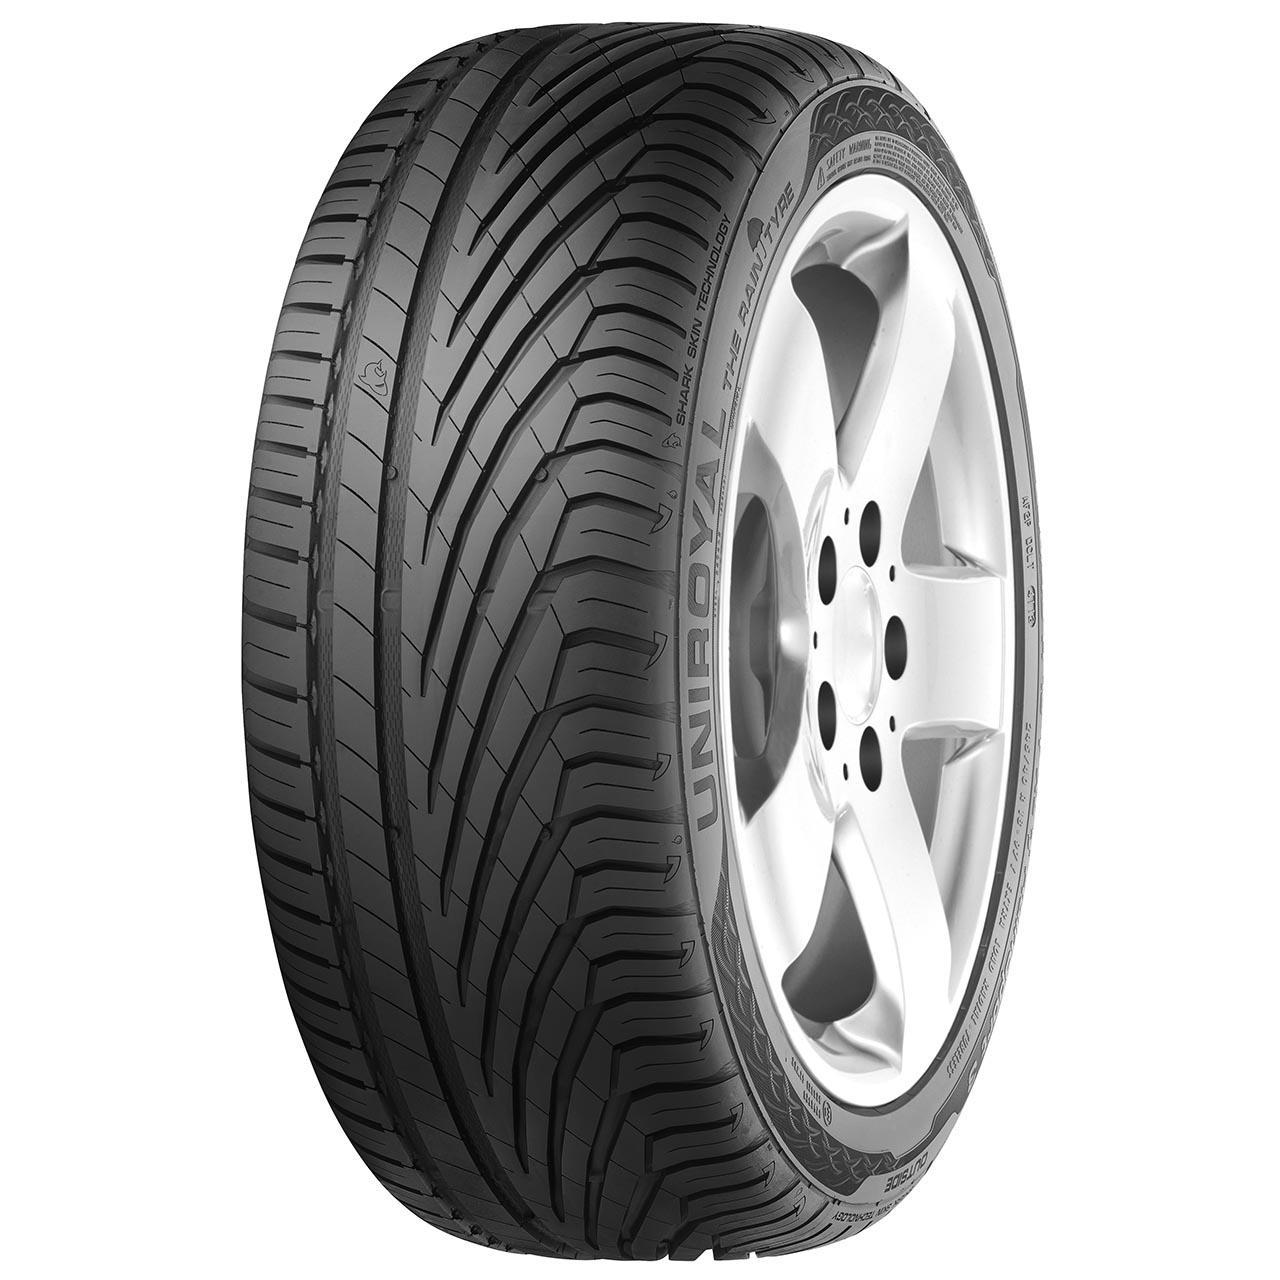 Uniroyal Rainsport 3 225/45R17 91V FR